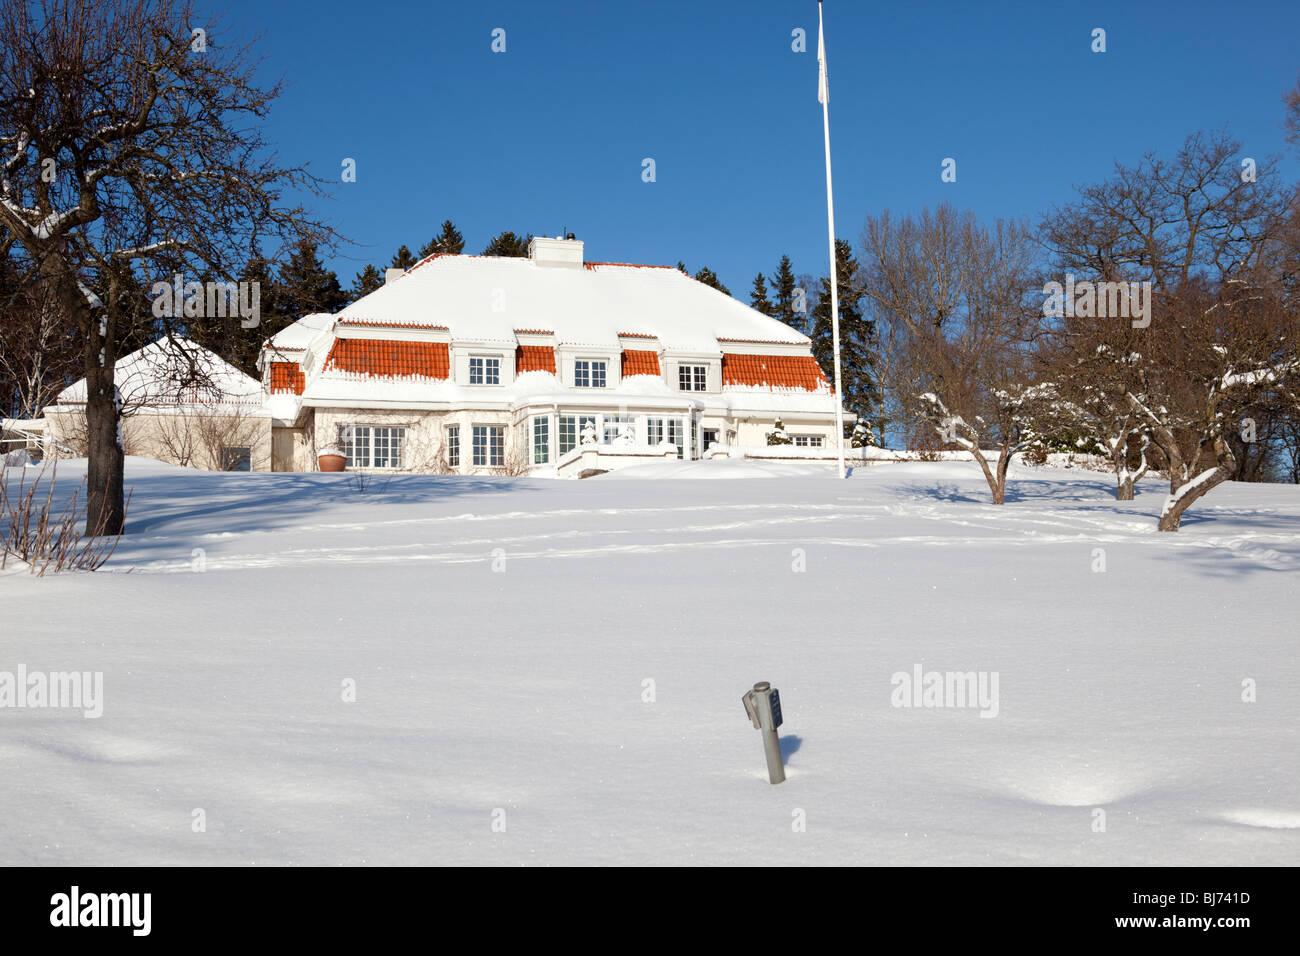 Villa Söderås, Lidingö (Sweden) - Stock Image